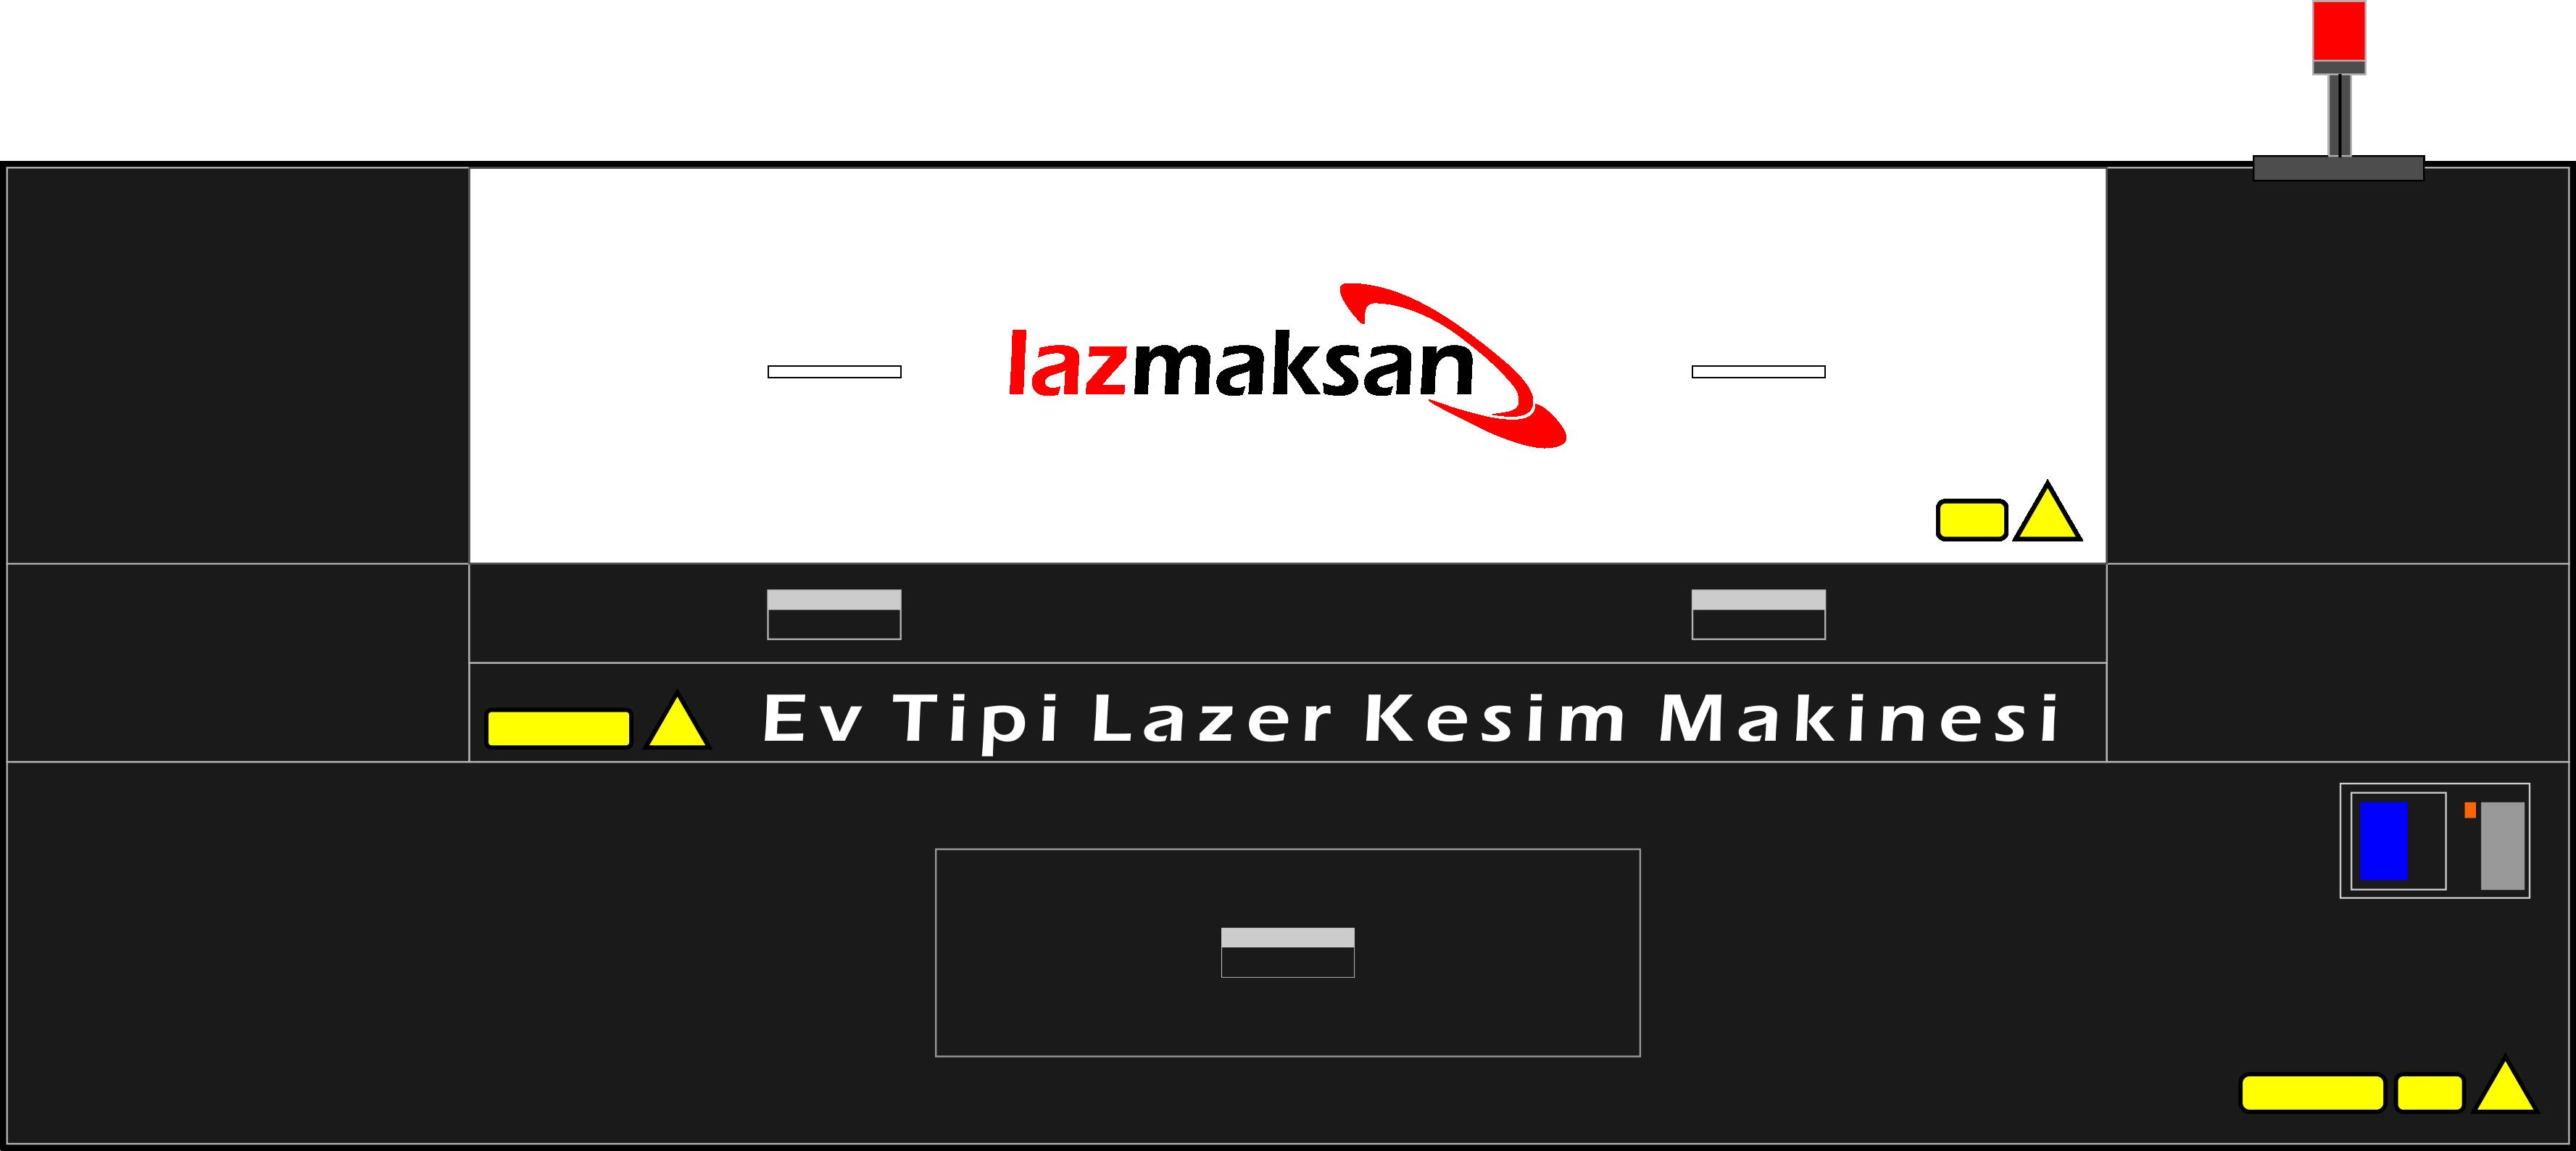 ev-tipi-lazer-kesim-makinesi-6040-front-side